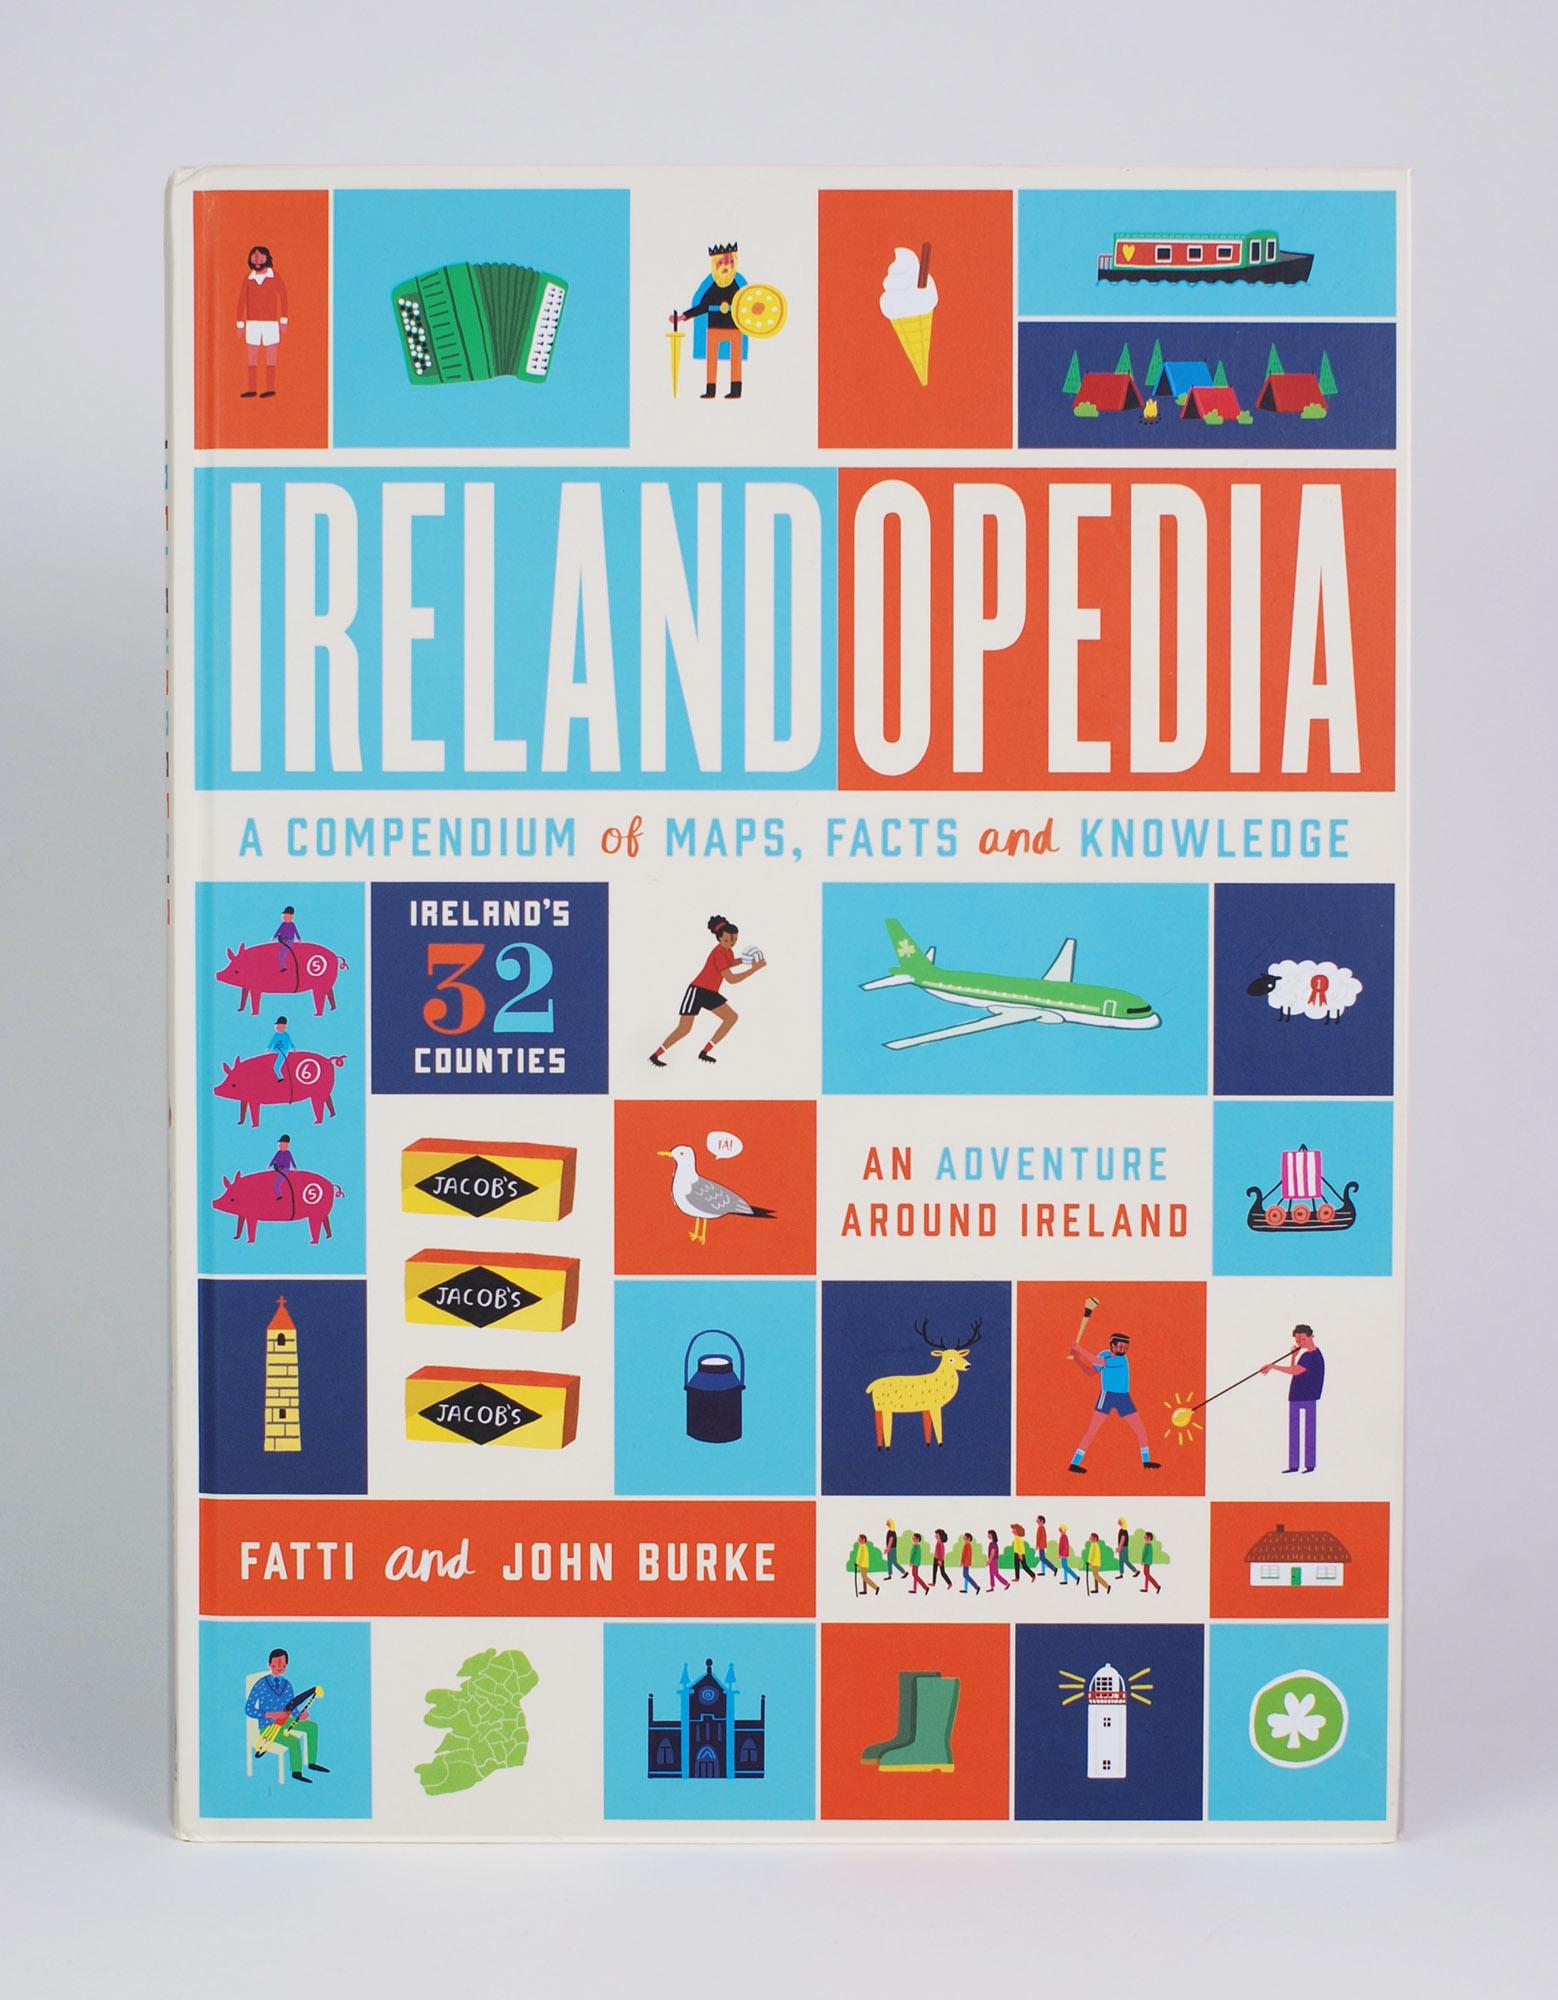 Cover image: Irelandopedia